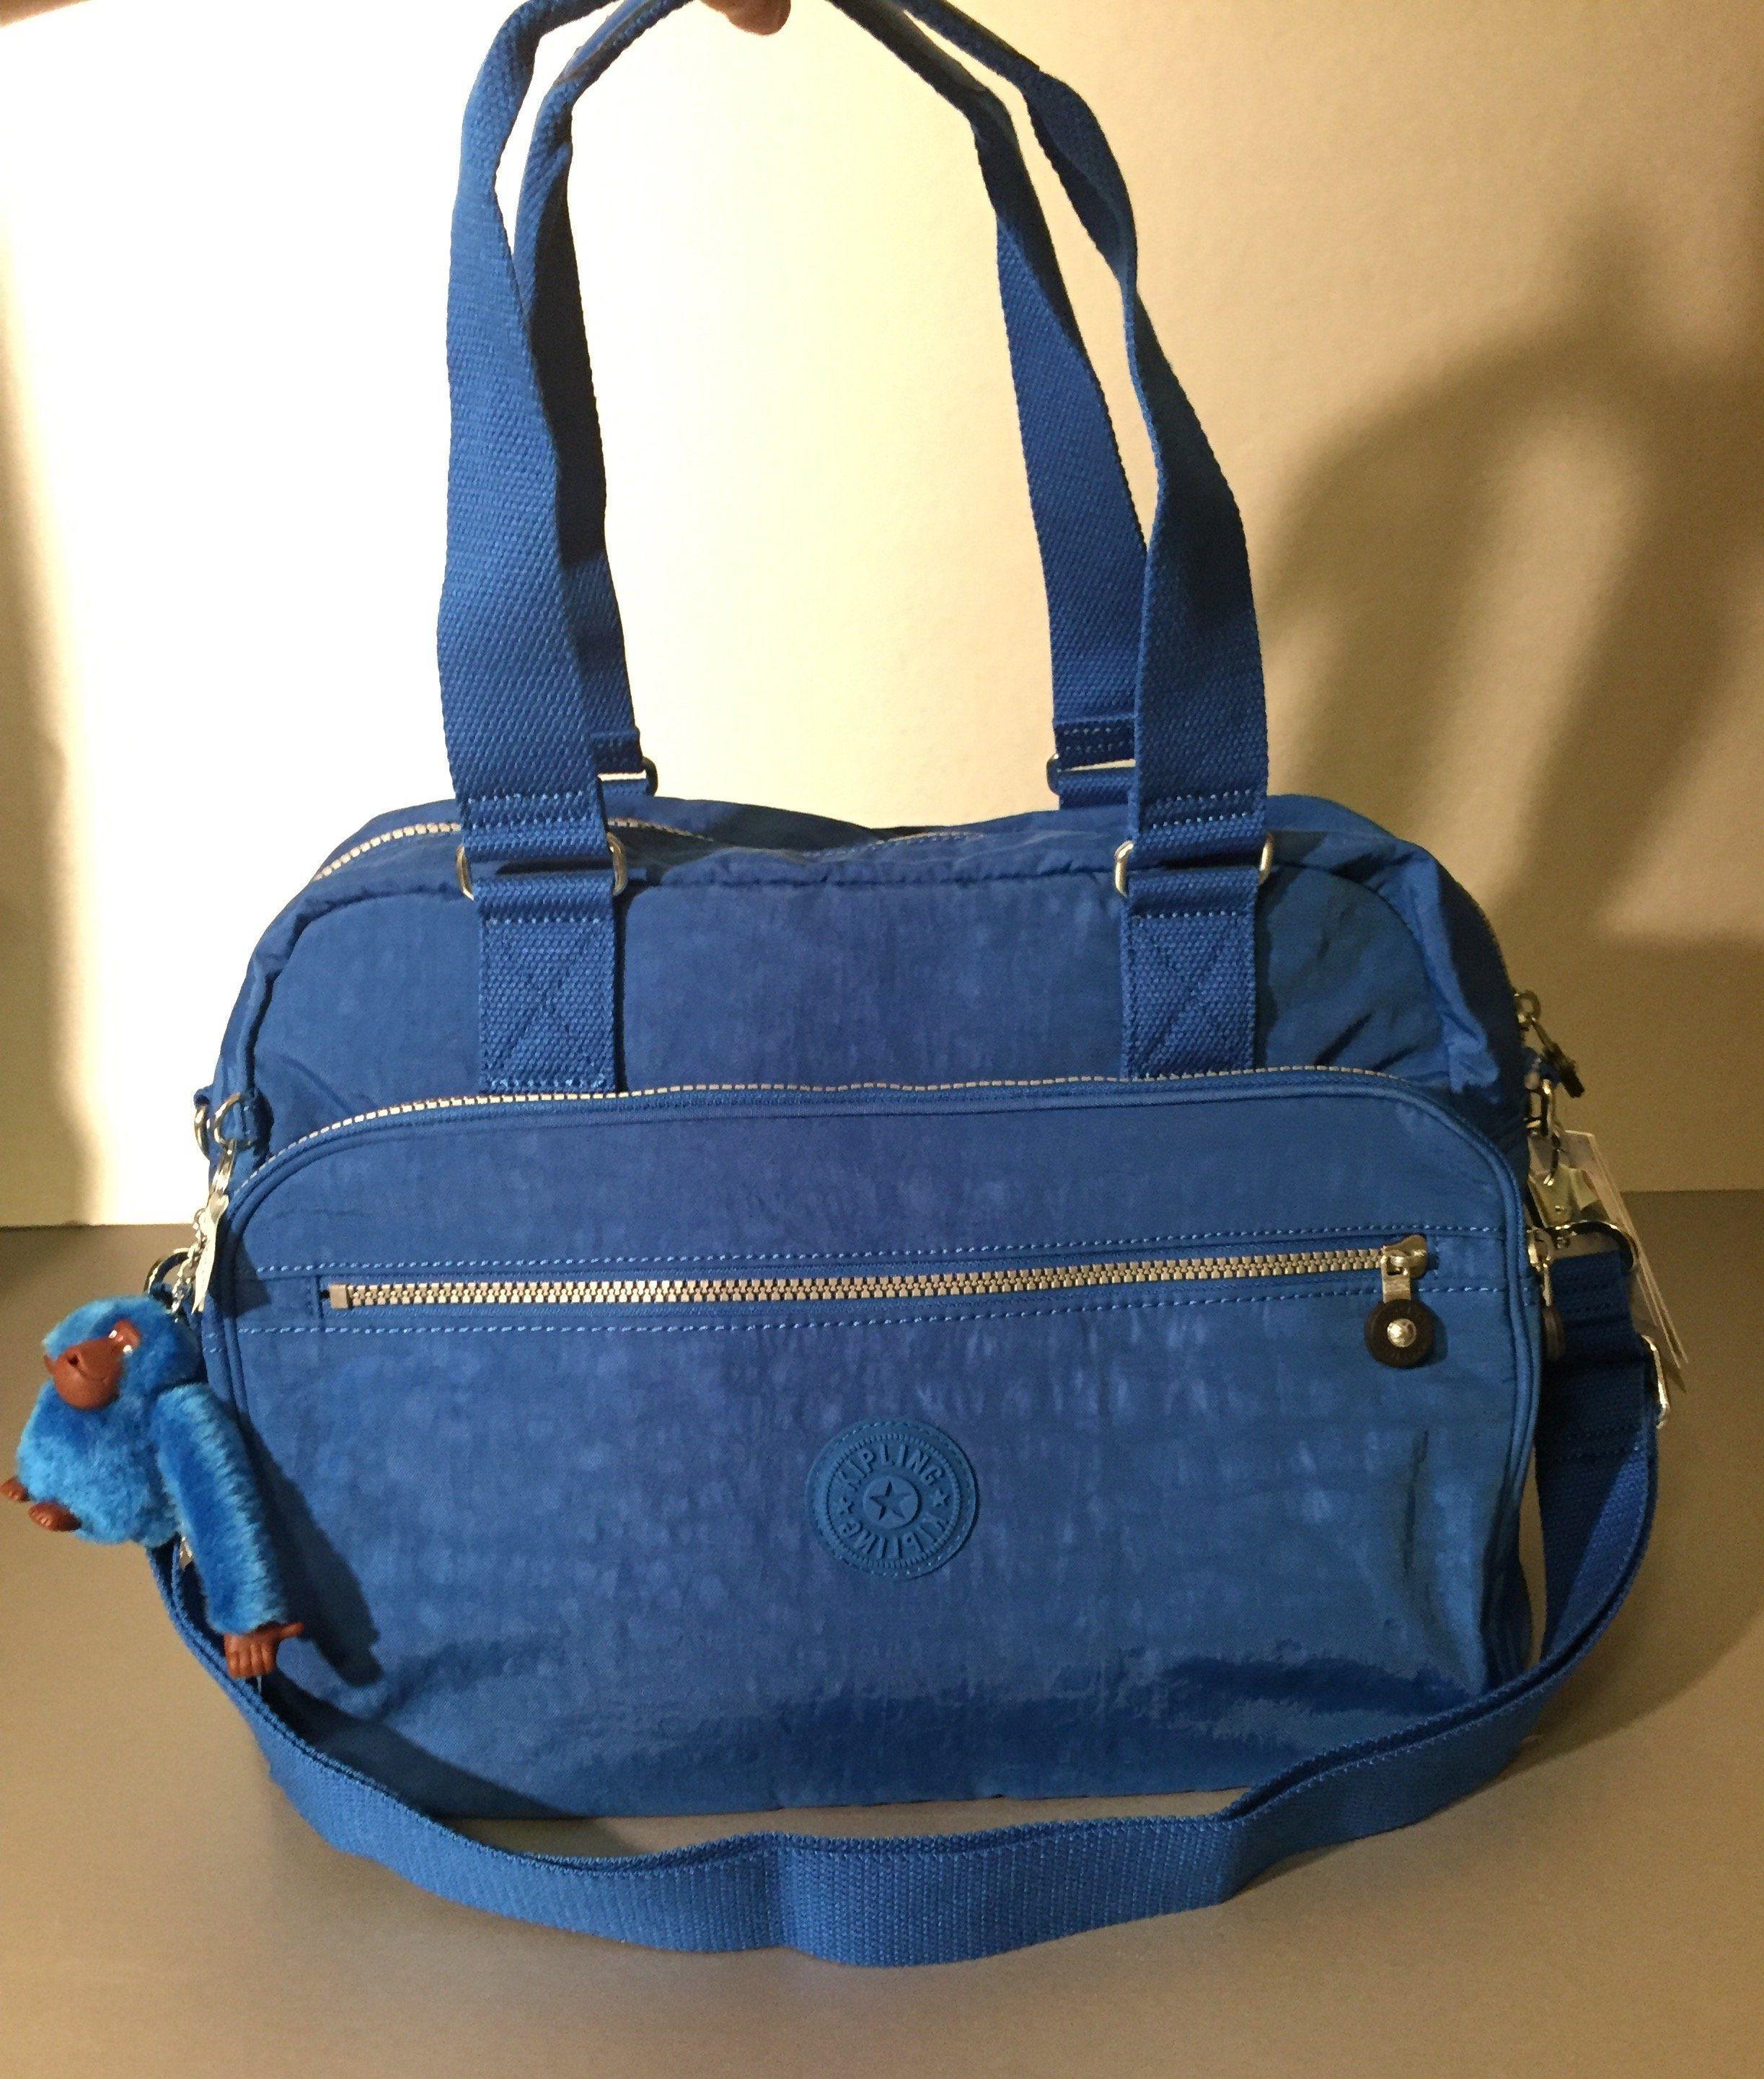 5b5b293a2 Kipling NewWeekend Duffle Travel Bag w/Trolley Sleeve French Blue ...